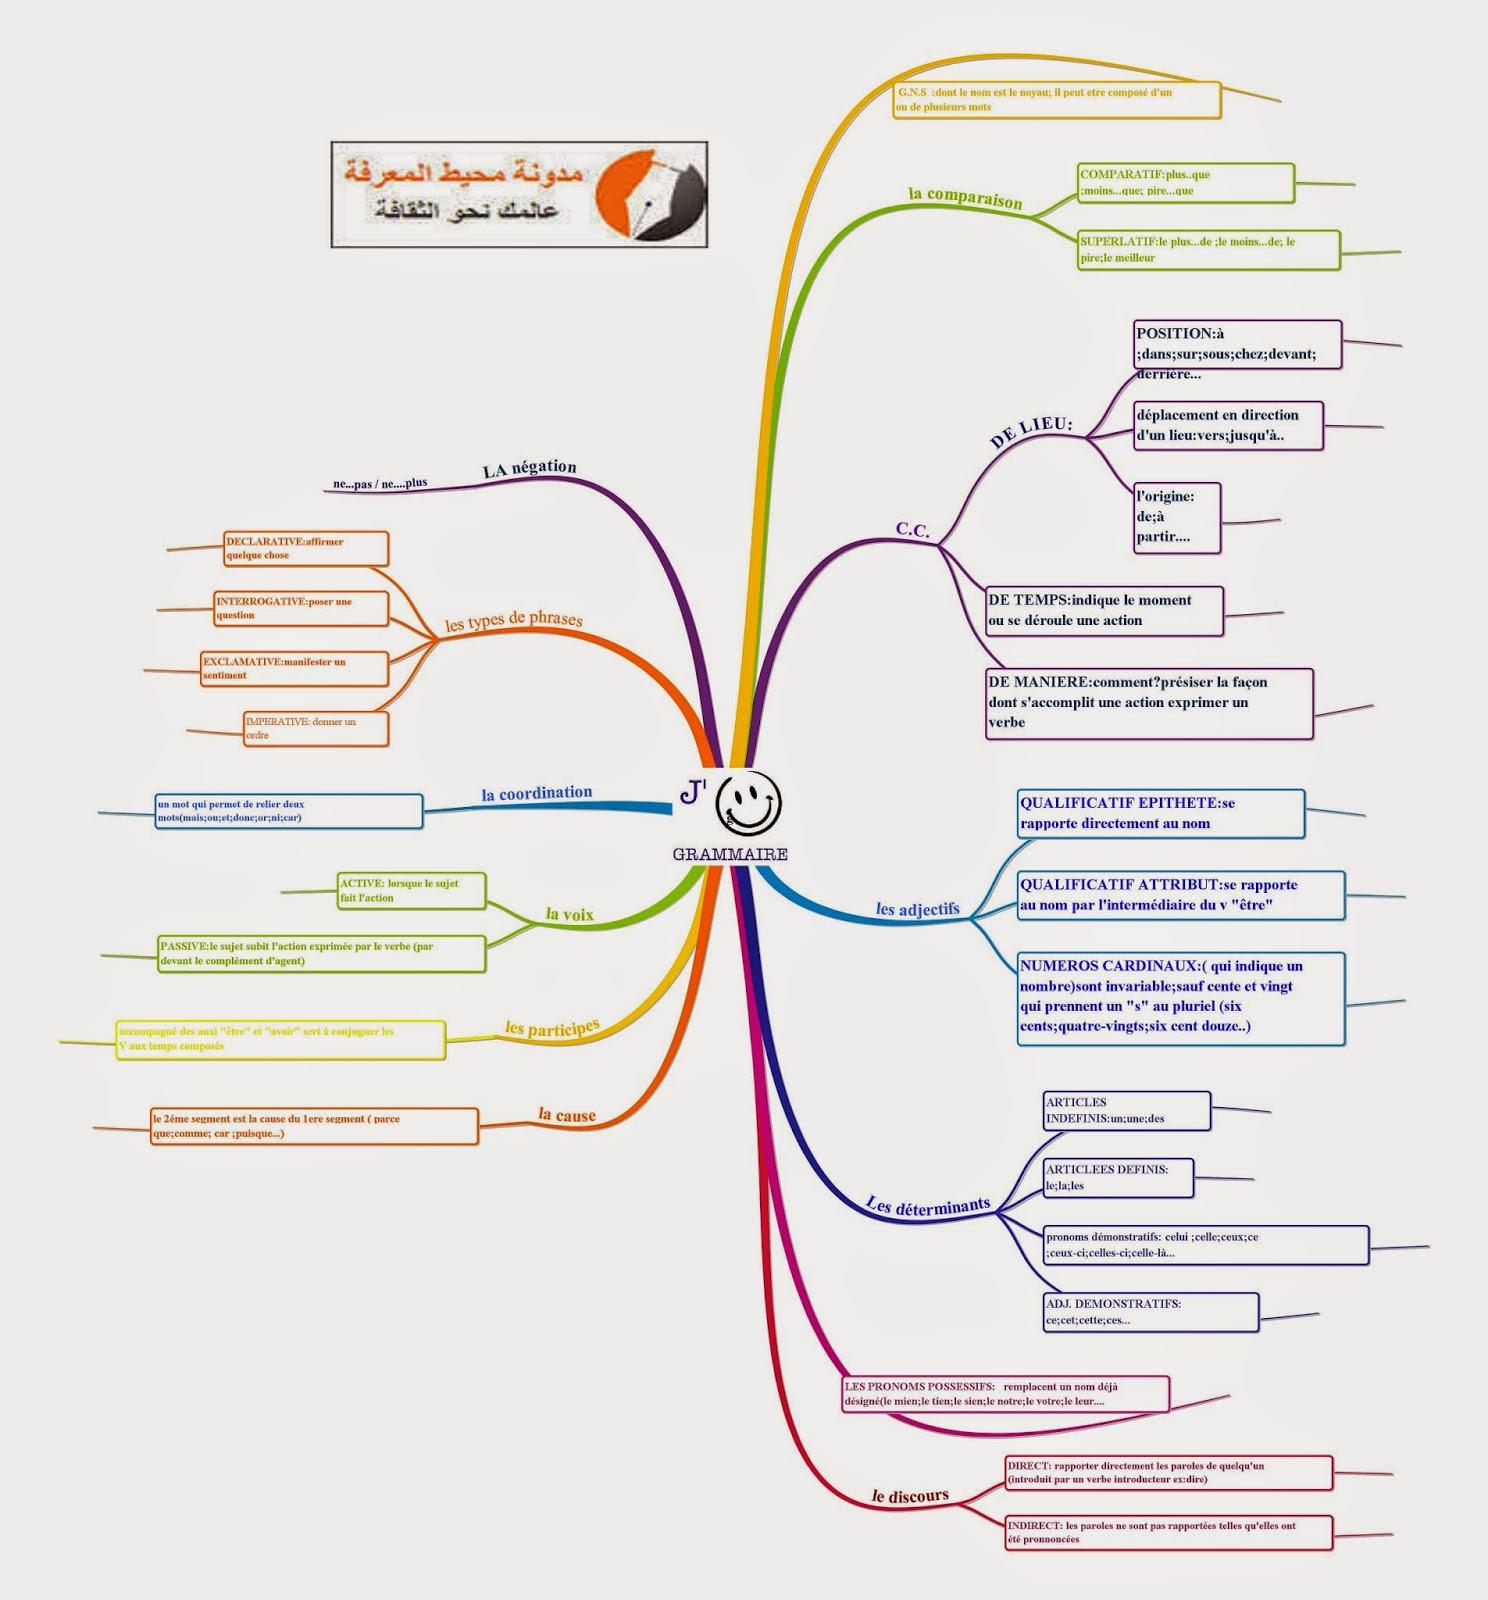 خريطة ذهنية لأساتذة القسم 6 : toutes les leçons de grammaire